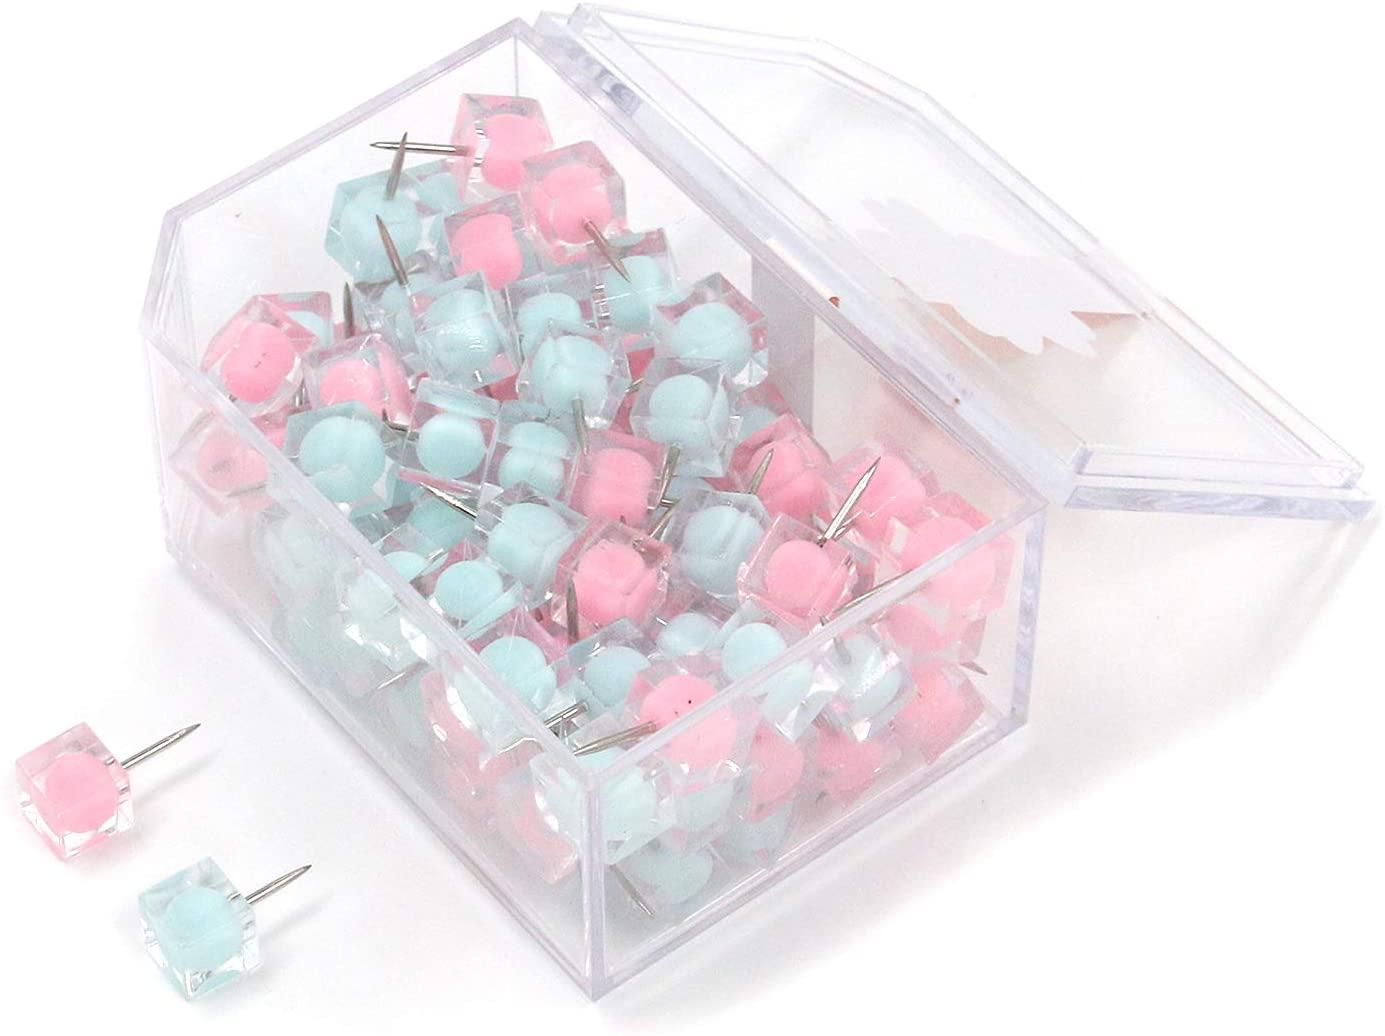 Quluxe 100 Pcs Colorful Transparent Square Tacks for Office, School, Home, Clear Colors Decorative Thumbtacks